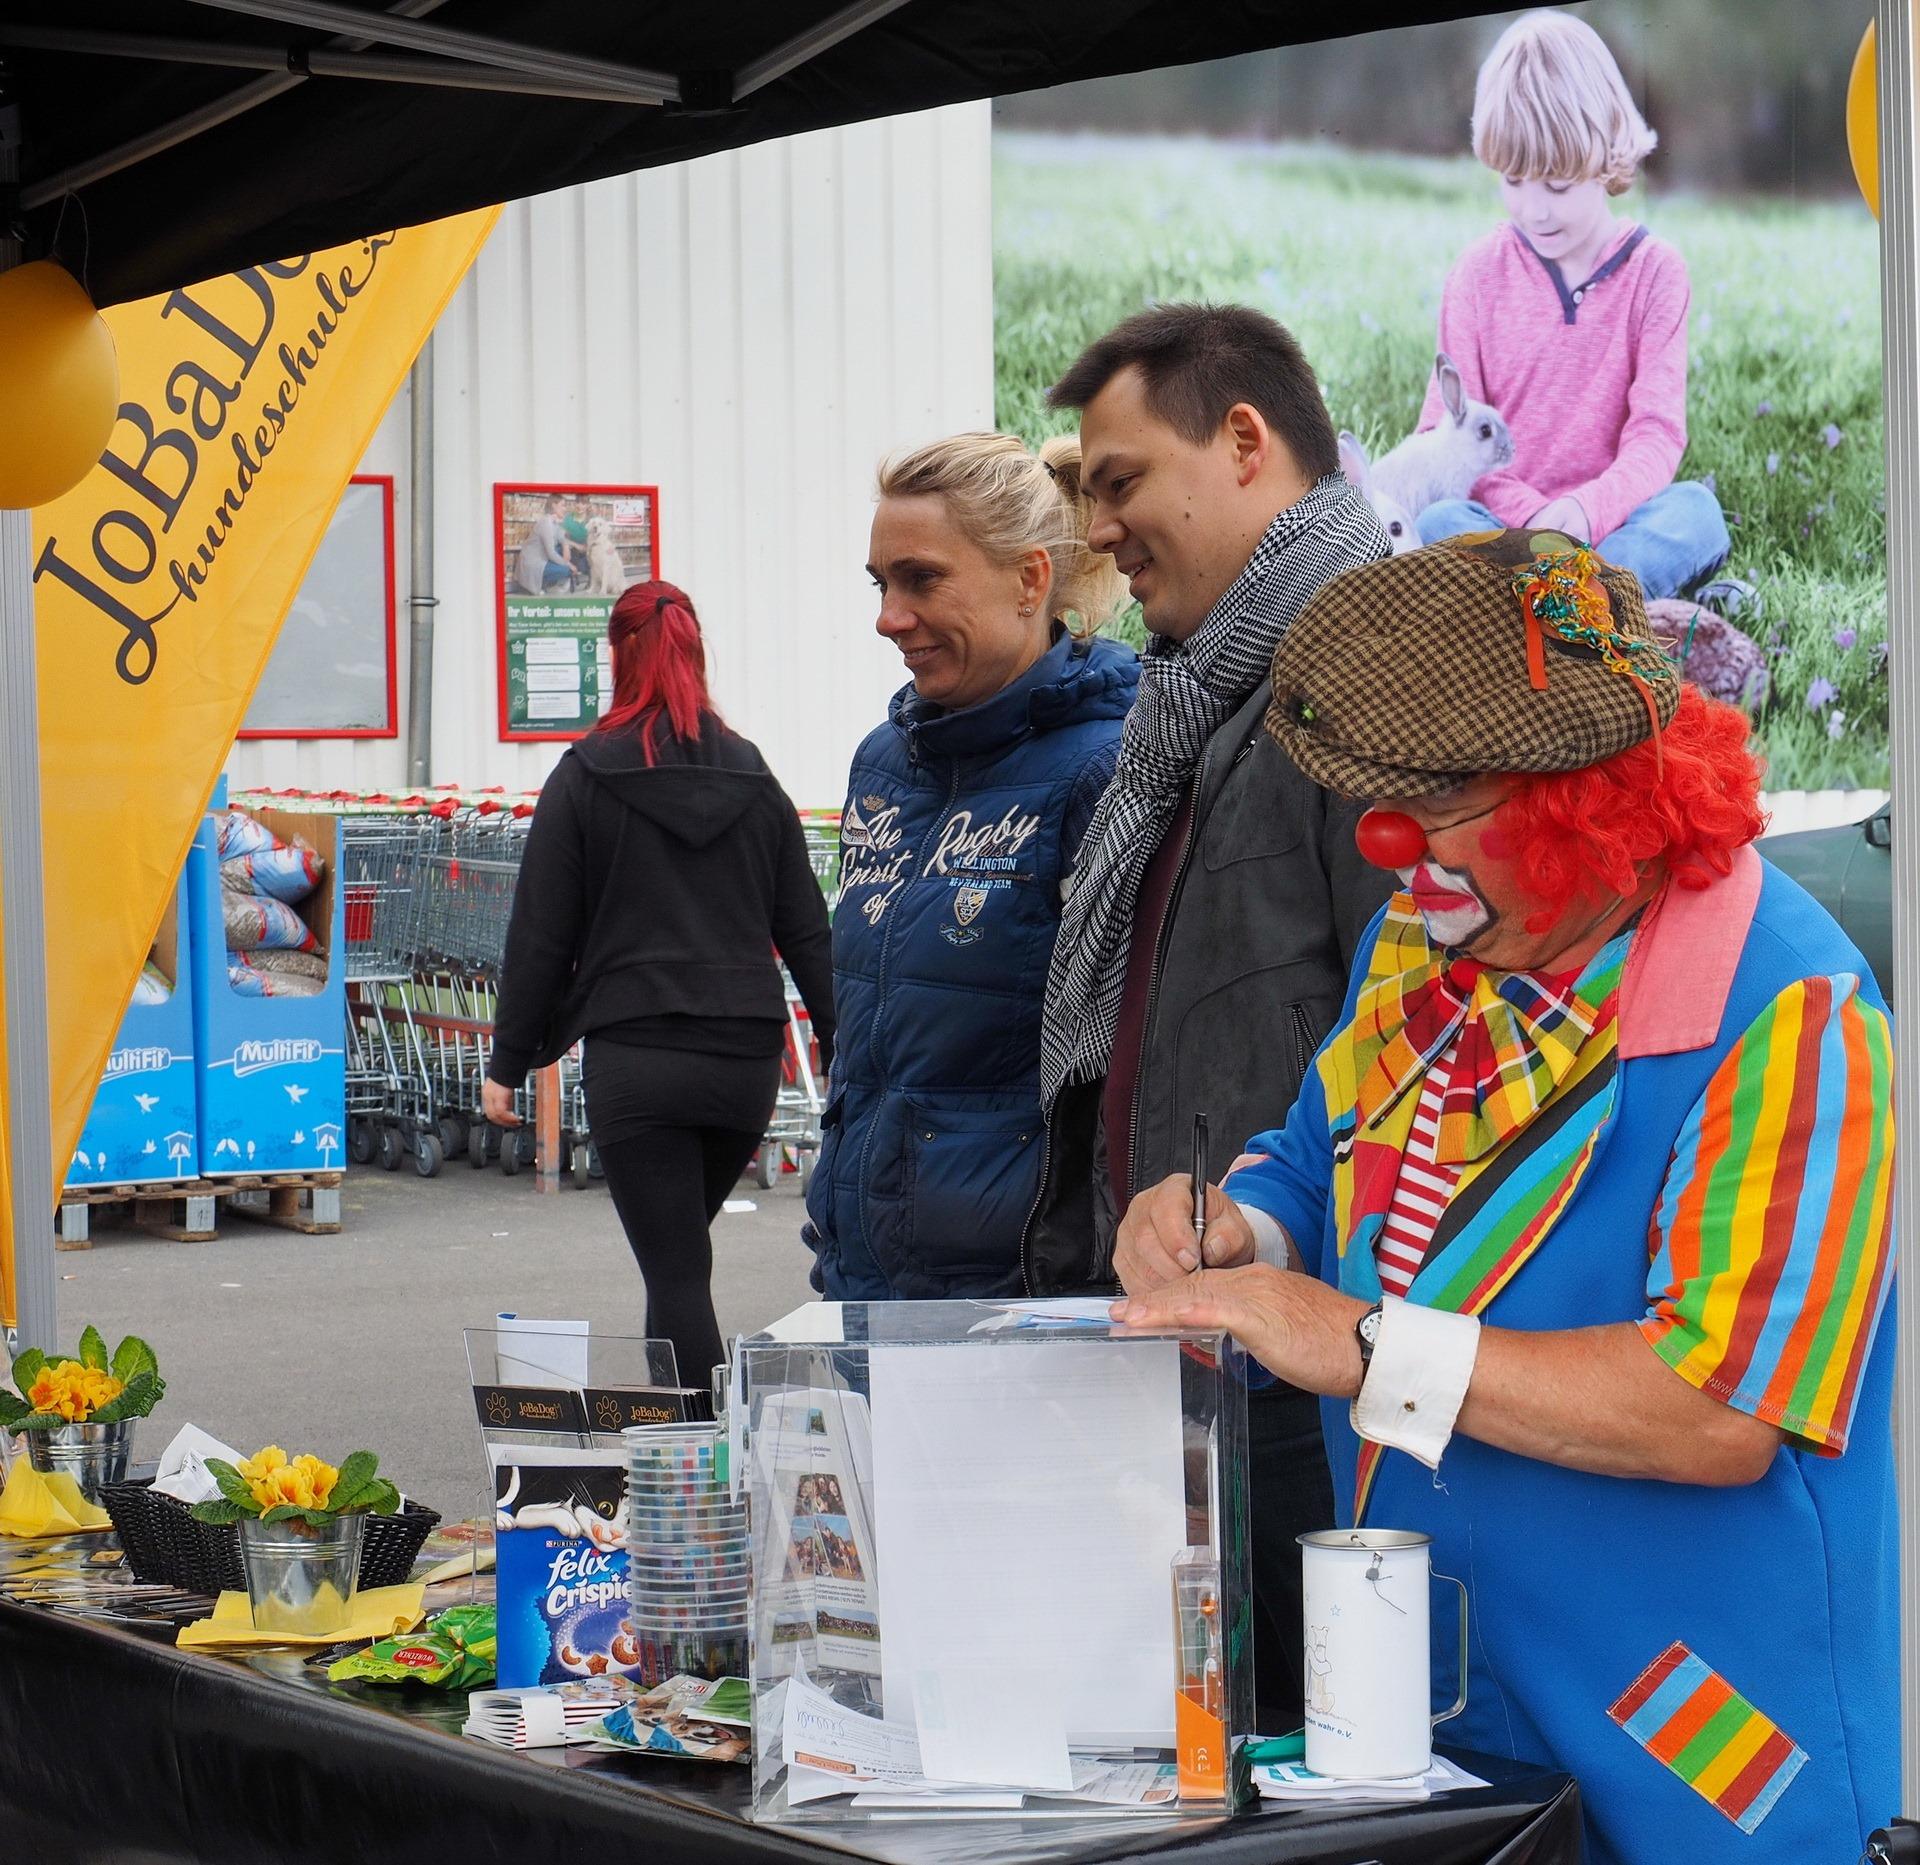 JoBaDog_Frühlingsfest_Fressnapf_Oranienburg_2019_36.jpg